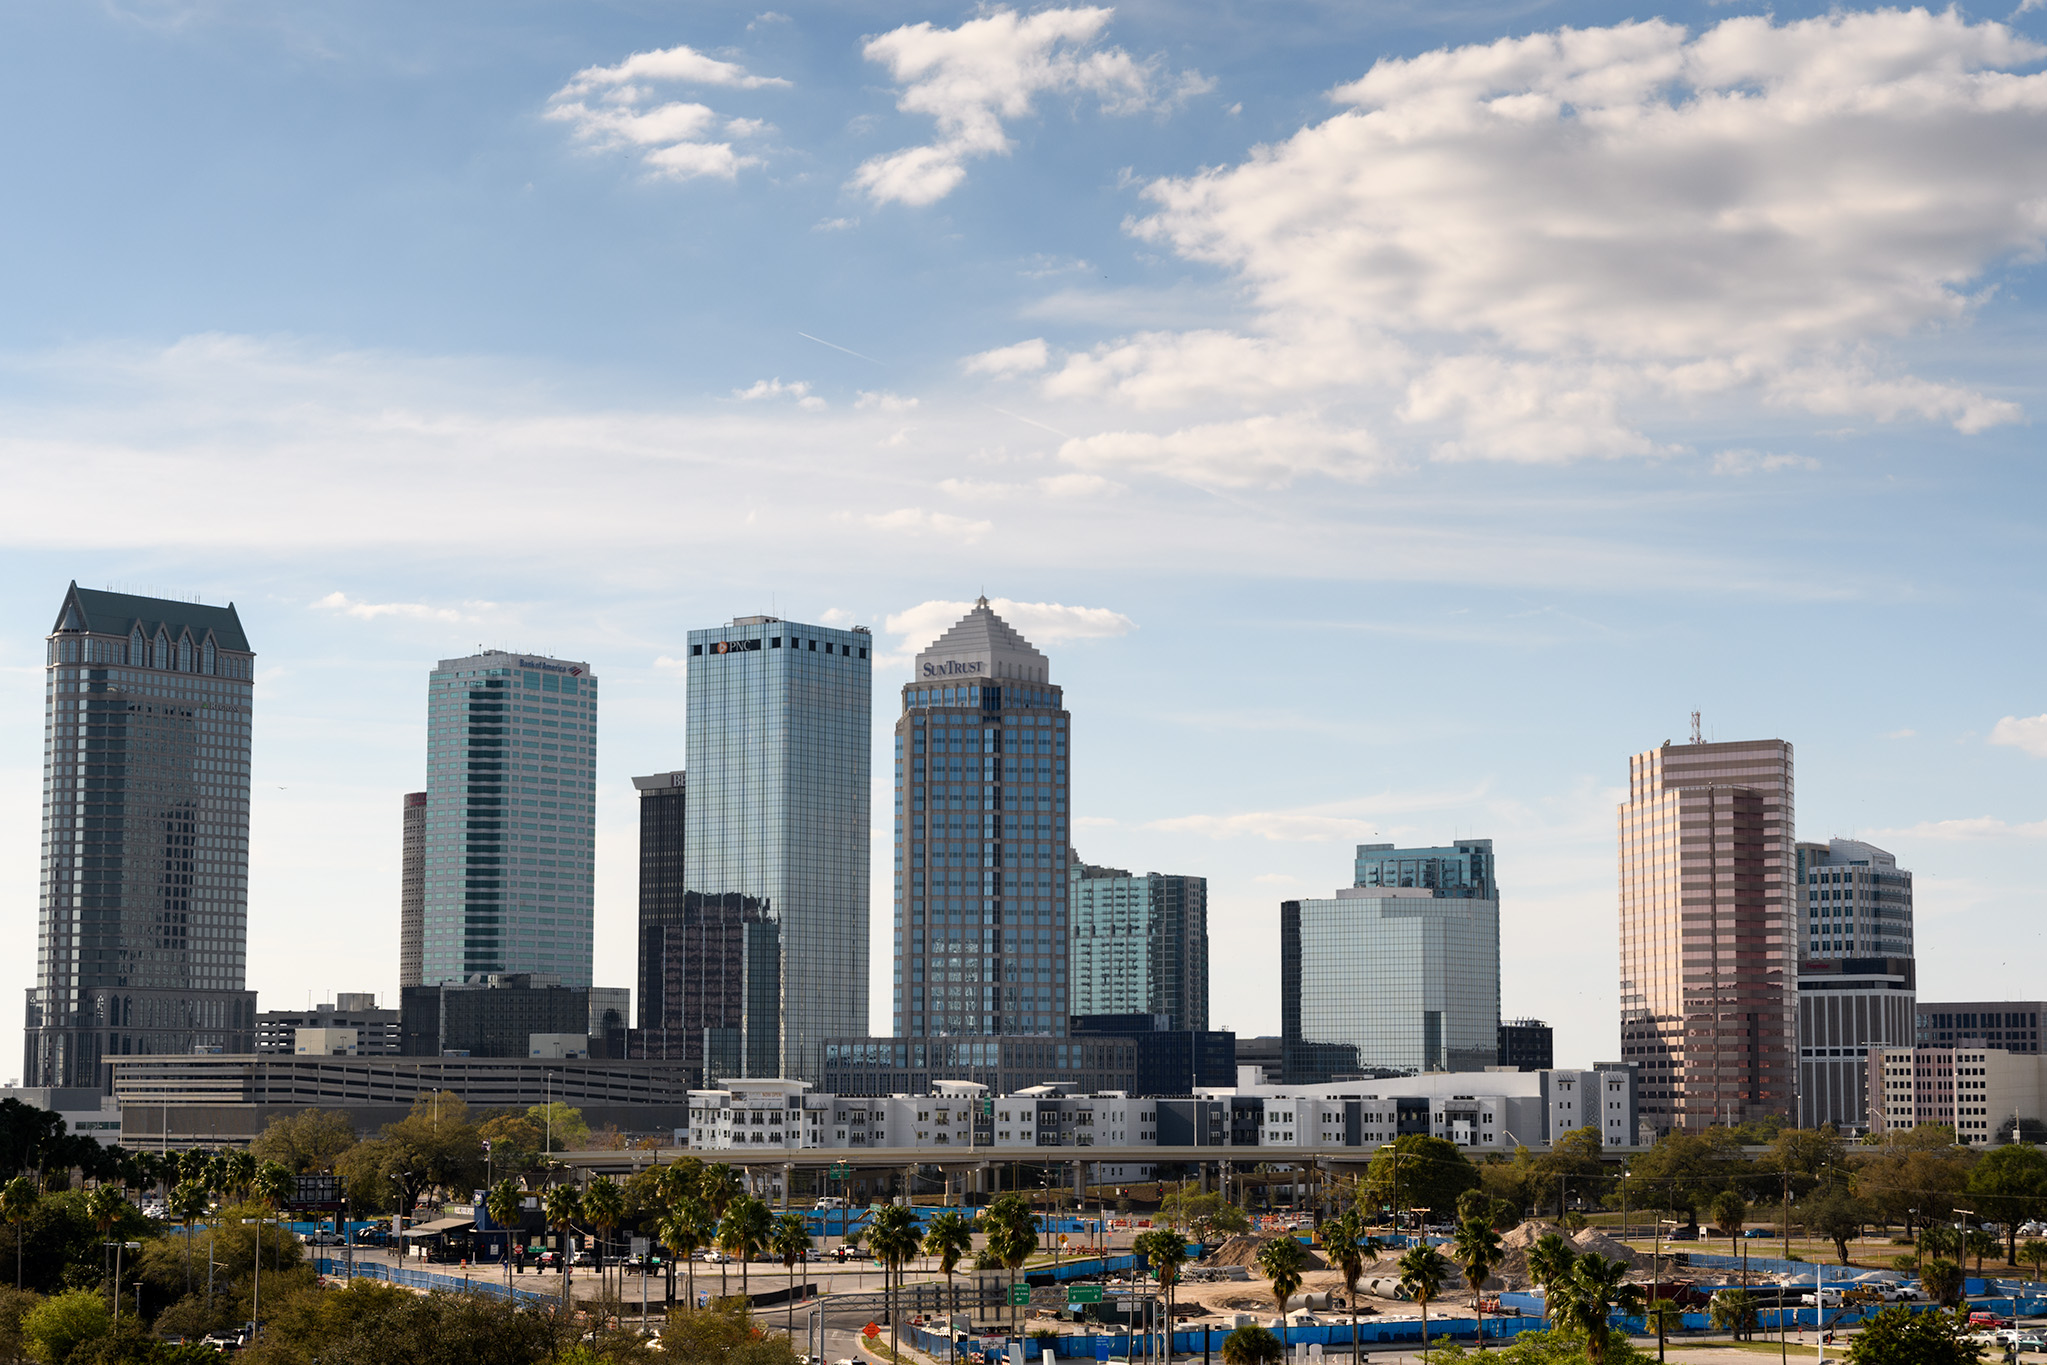 20170304 - Port of Tampa - 006.jpg